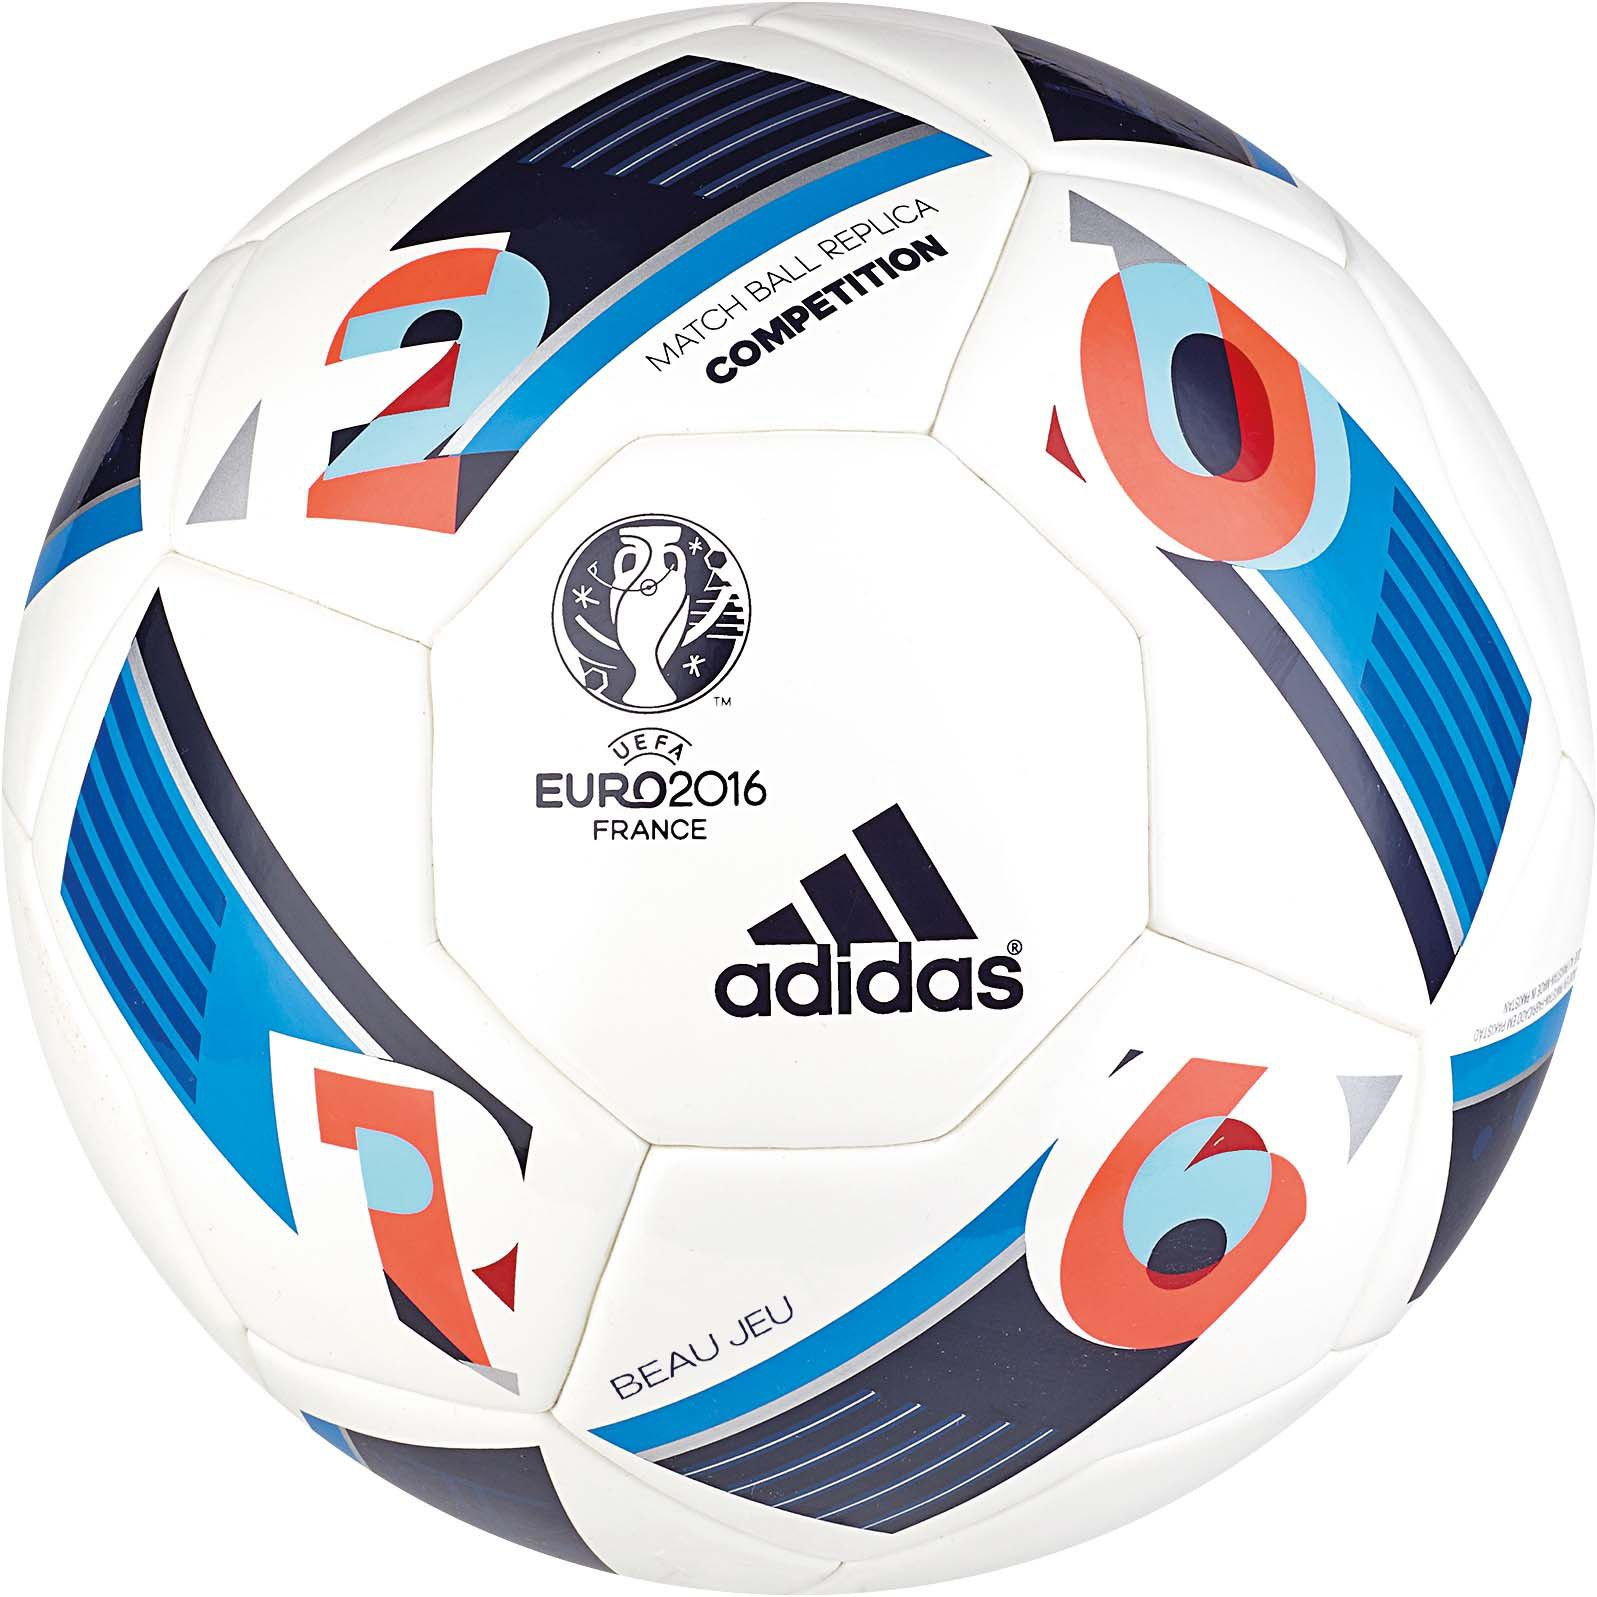 ADIDAS PERFORMANCE adidas Performance Euro 2016 Beau Jeu Competition Fußball